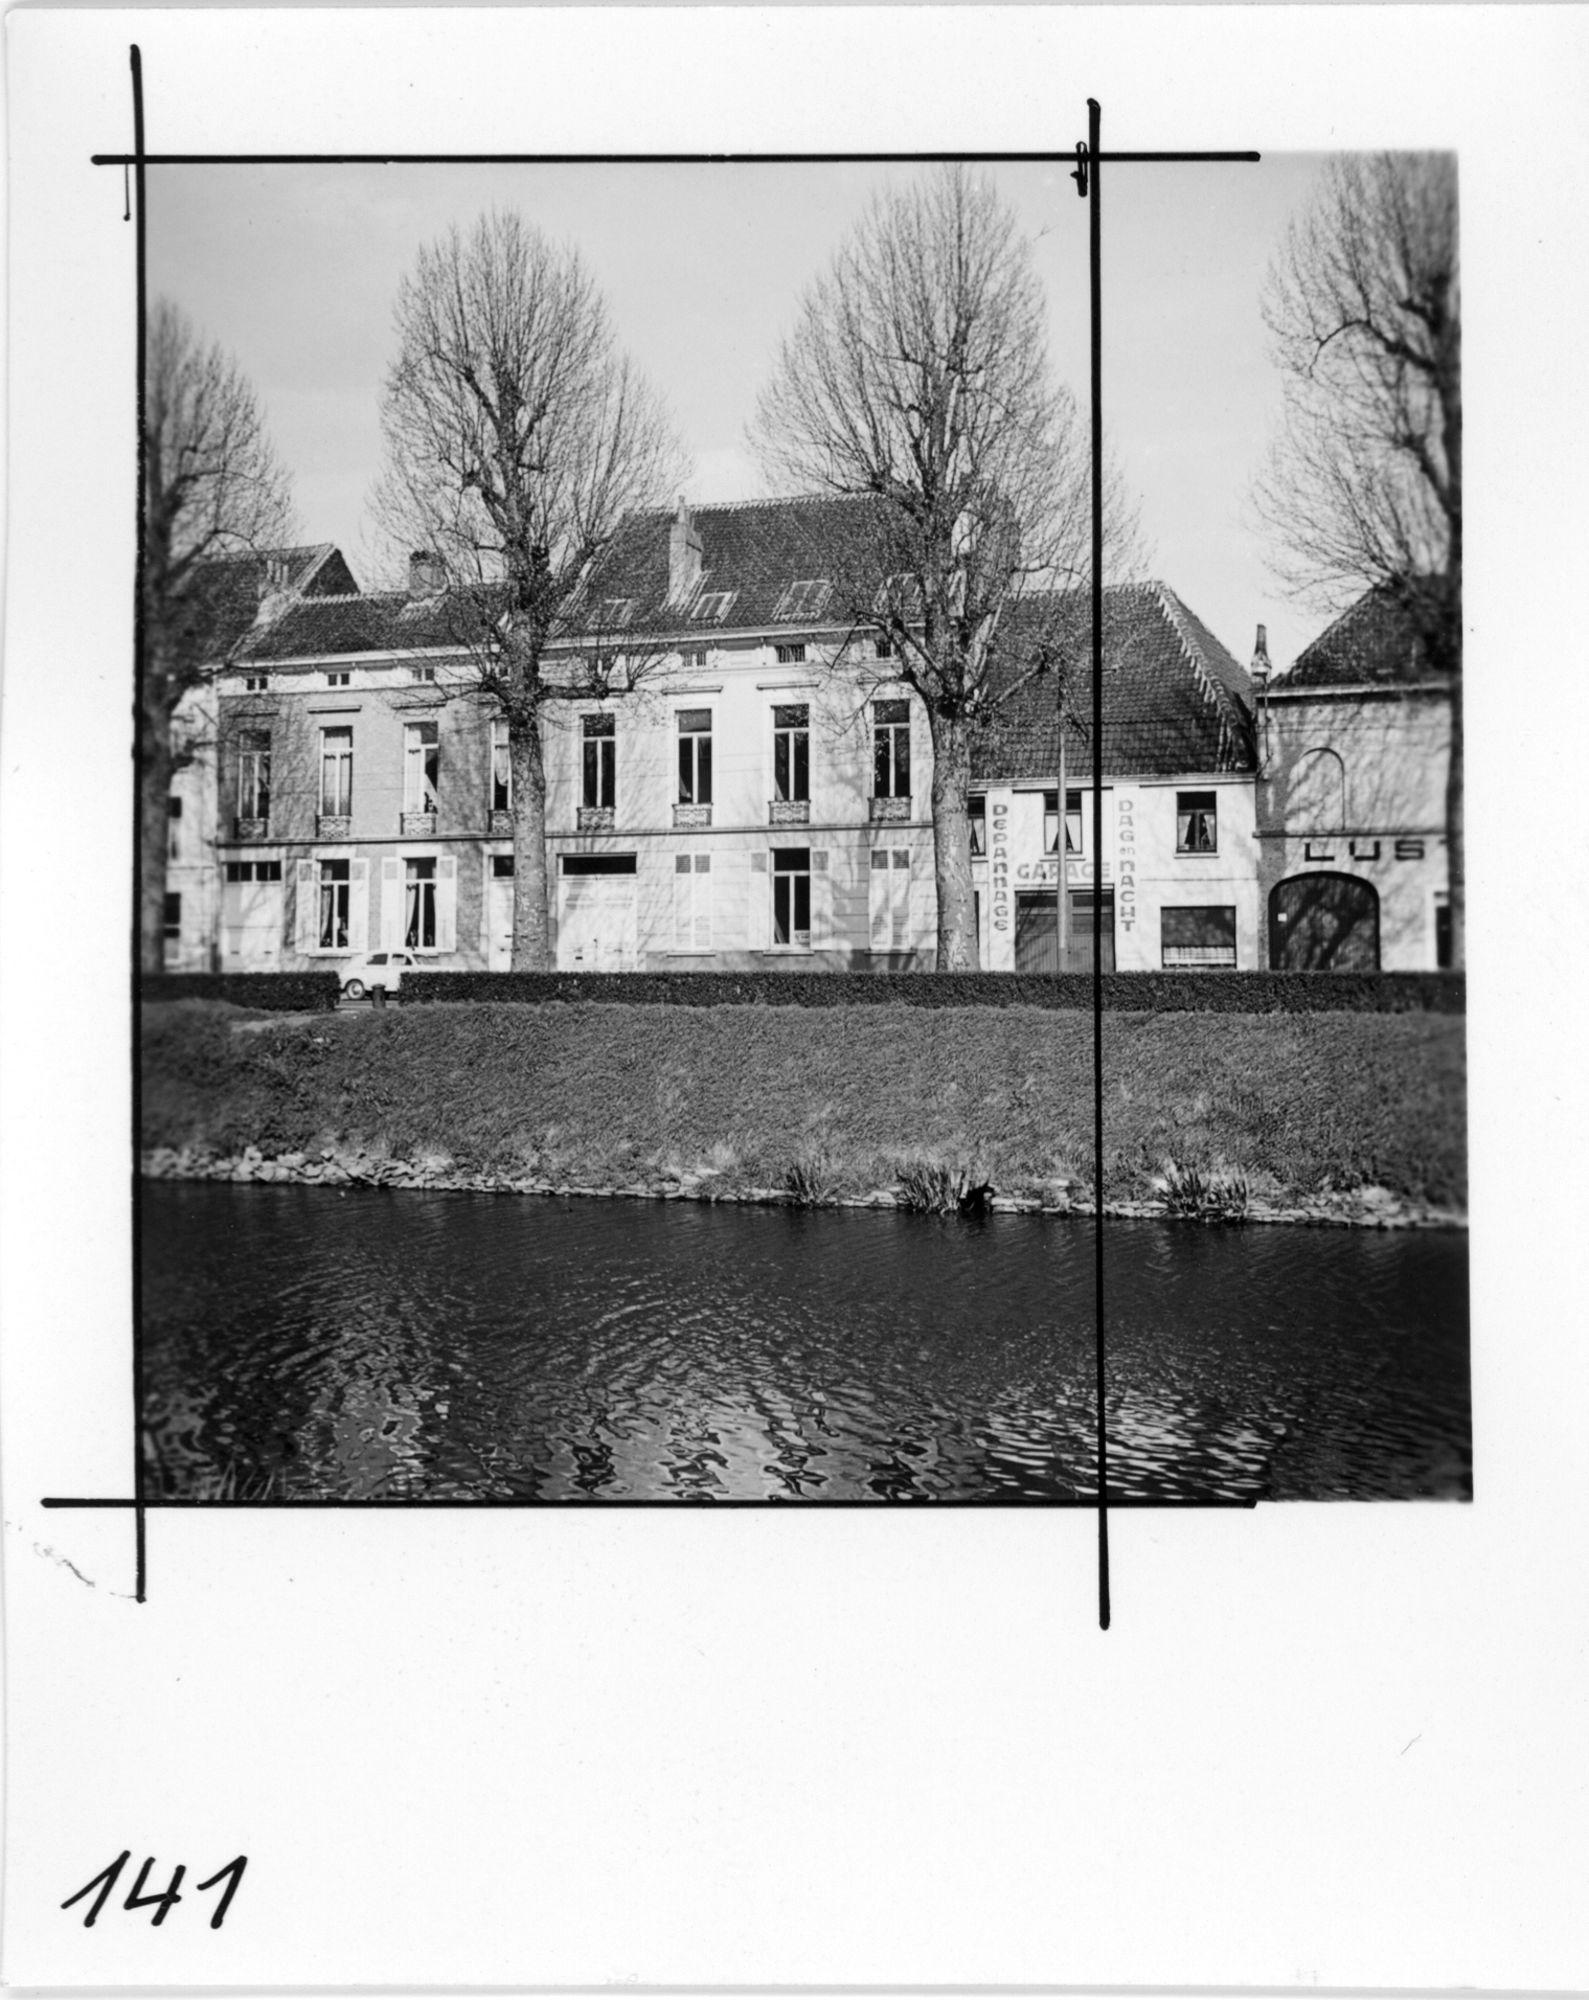 Coupure23_19610412.jpg